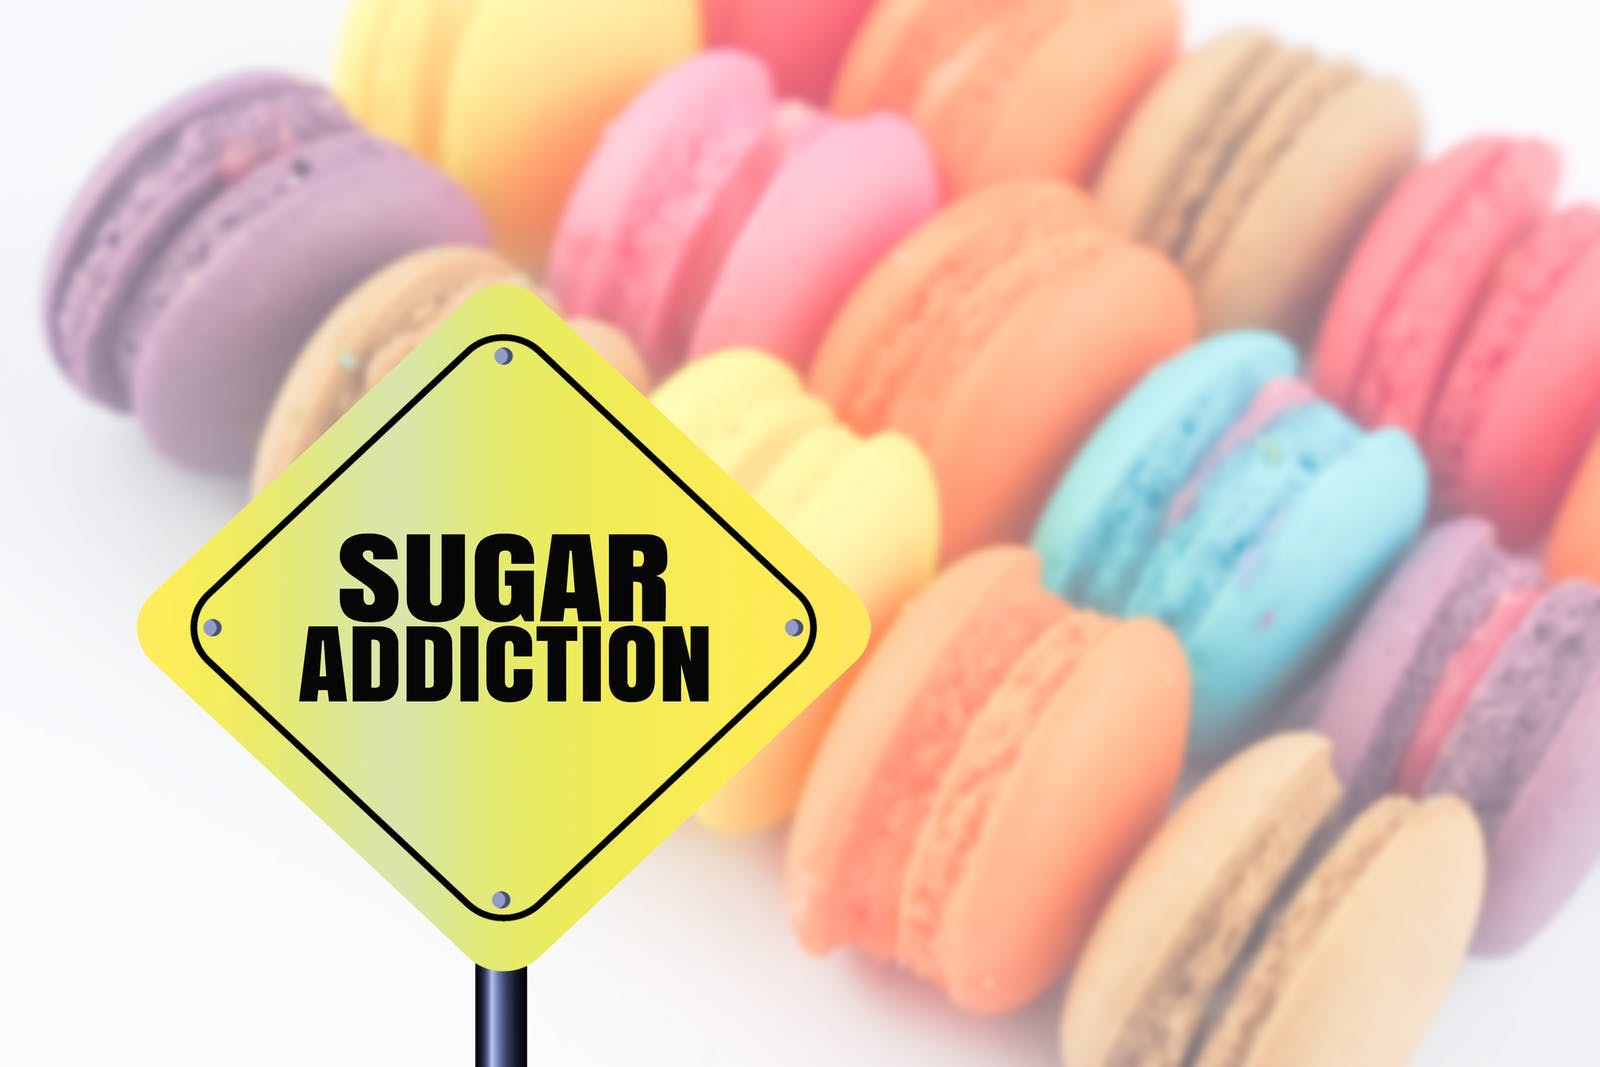 word sugar addiction blurred colorful sweet macaron